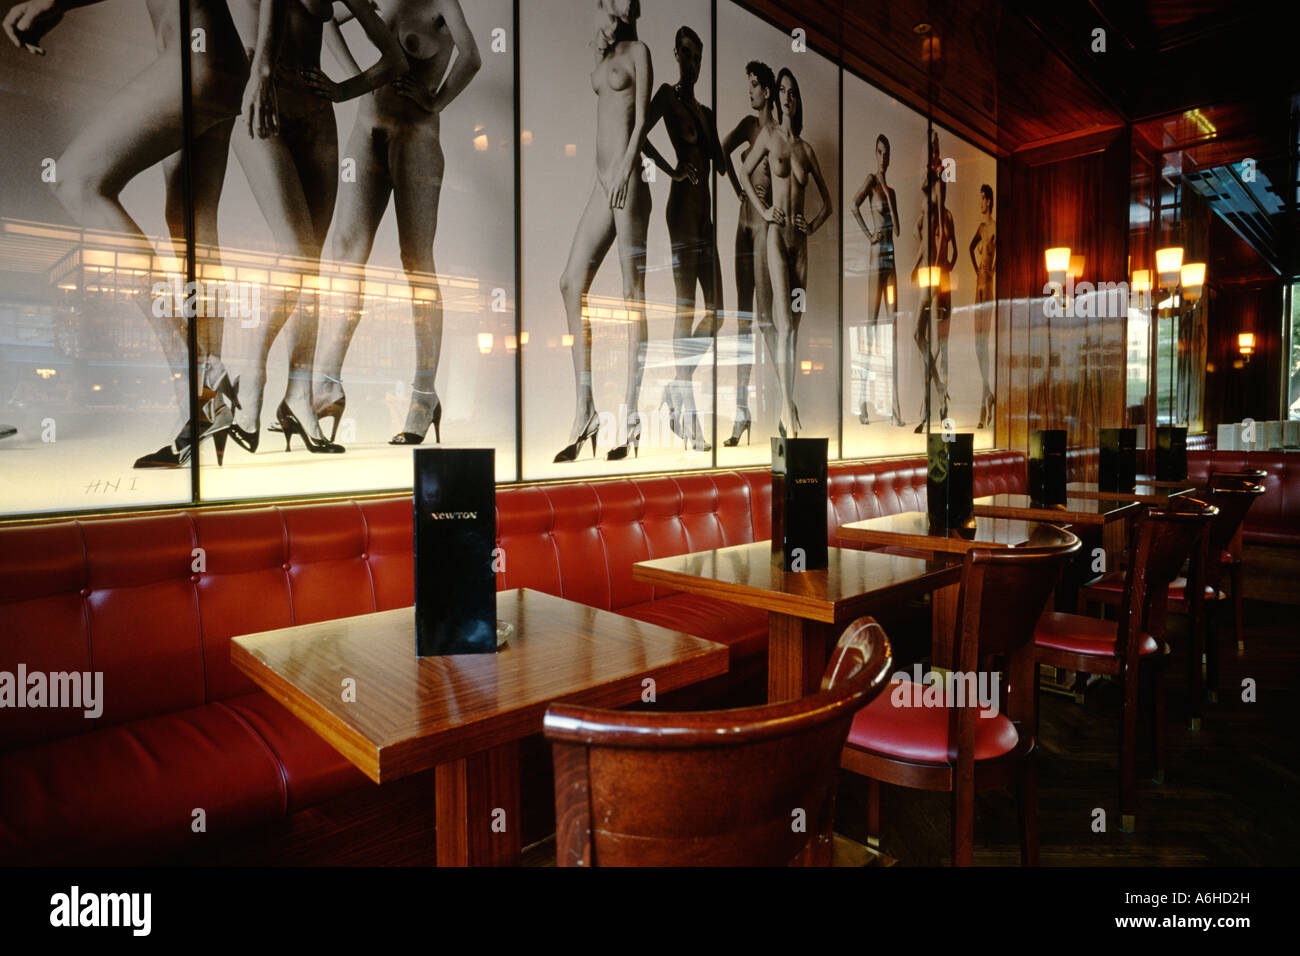 Berlin Germany Newton Bar on Charlottenstrasse with